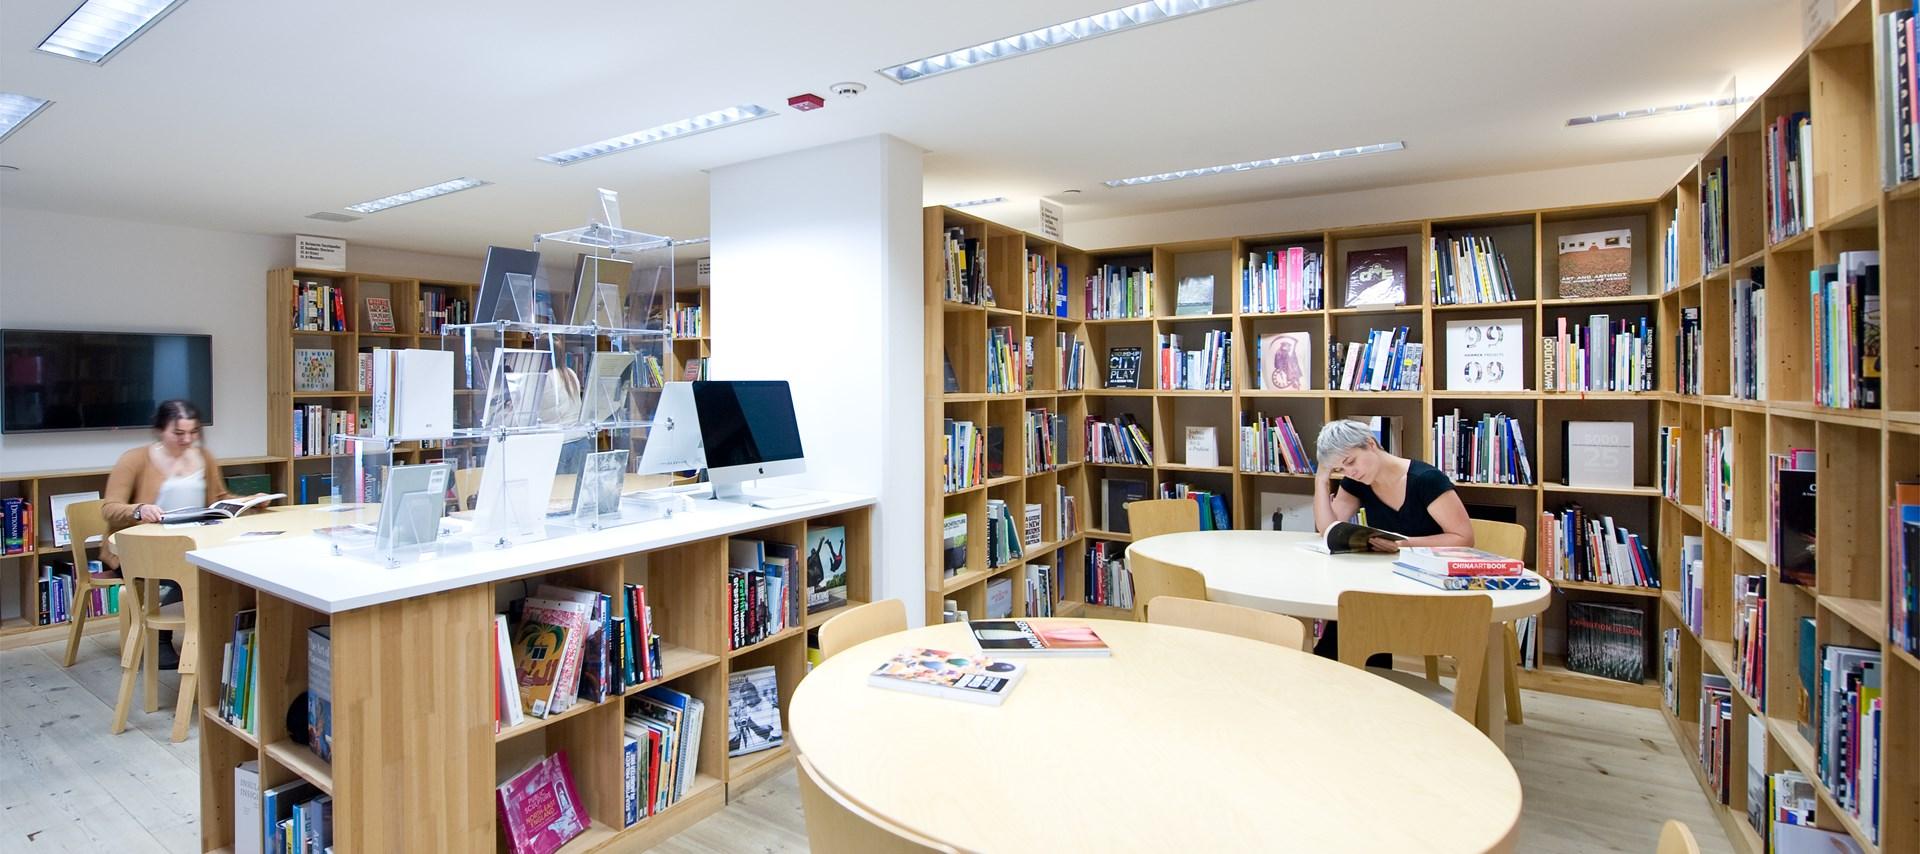 BALTIC Library by Colin Davison